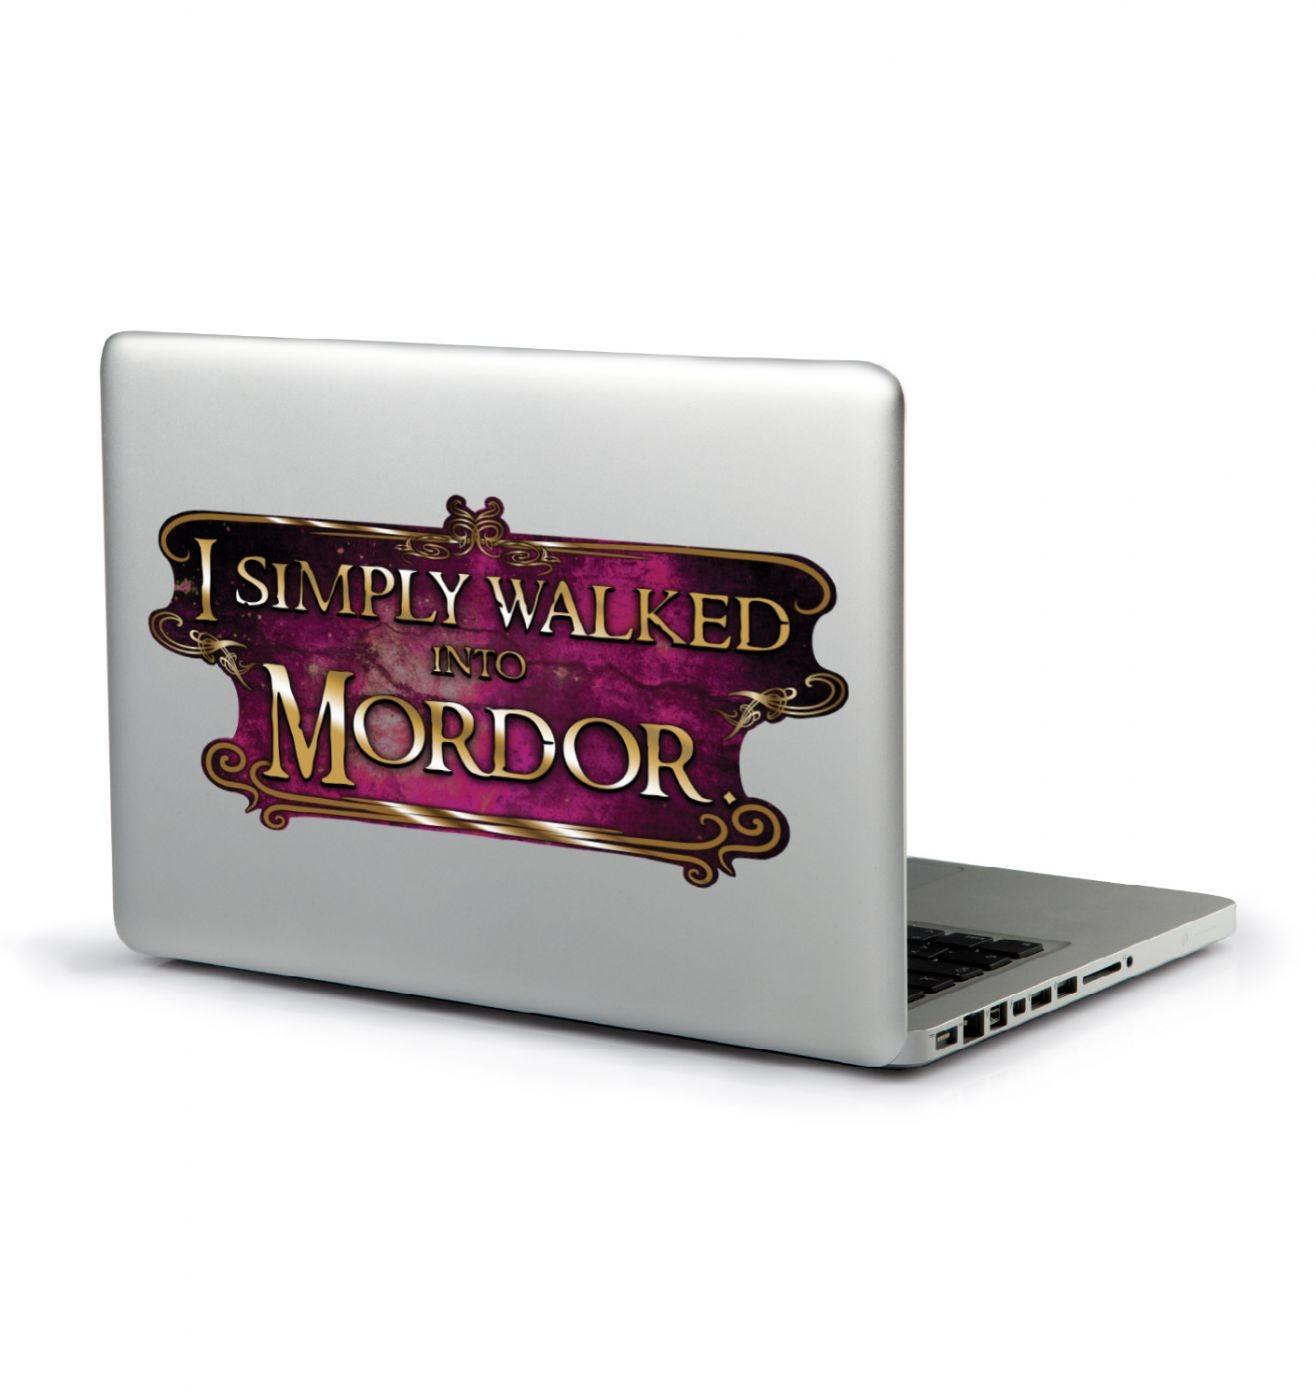 I Simply Walked Into Mordor laptop sticker (magenta)